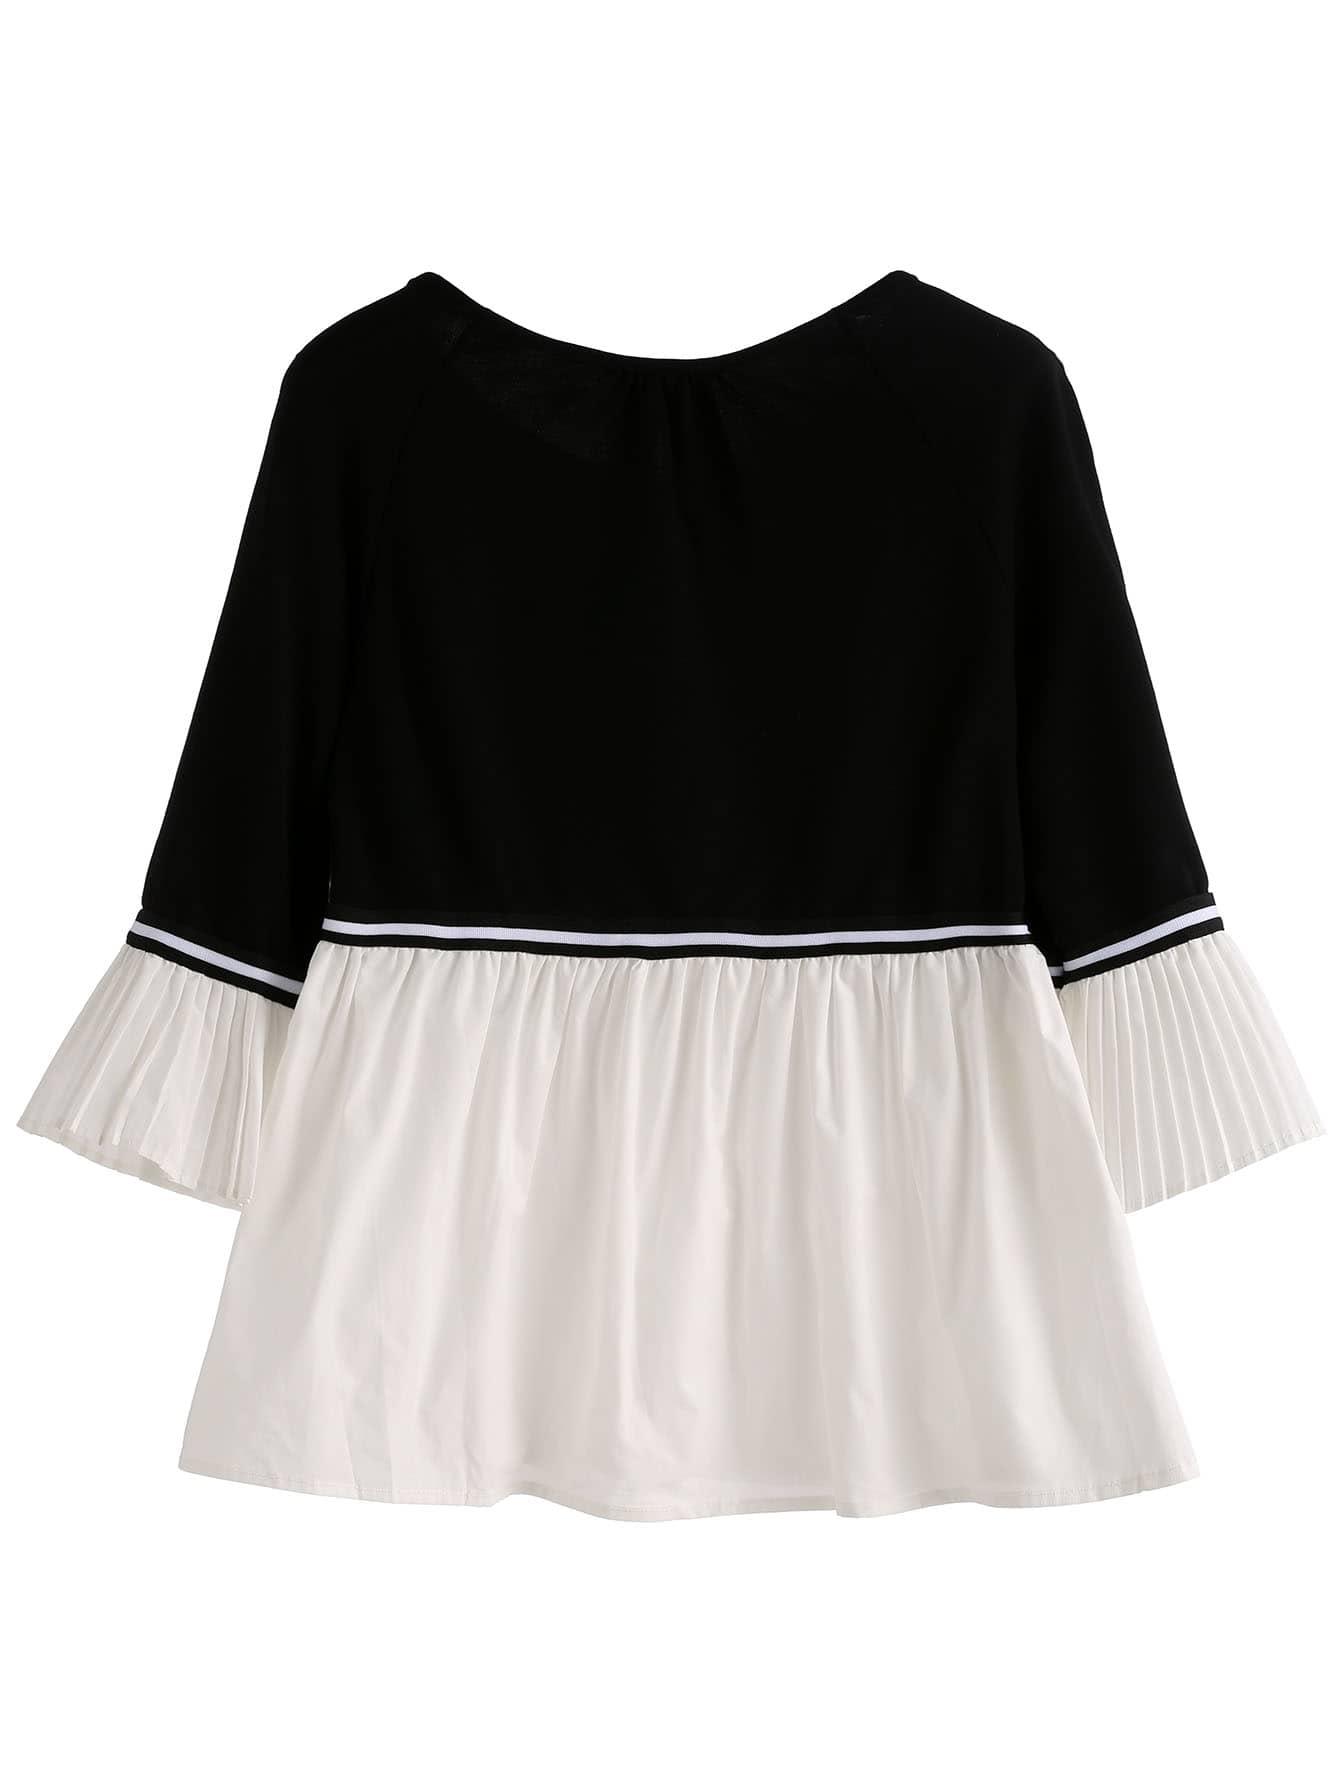 blouse160906021_2